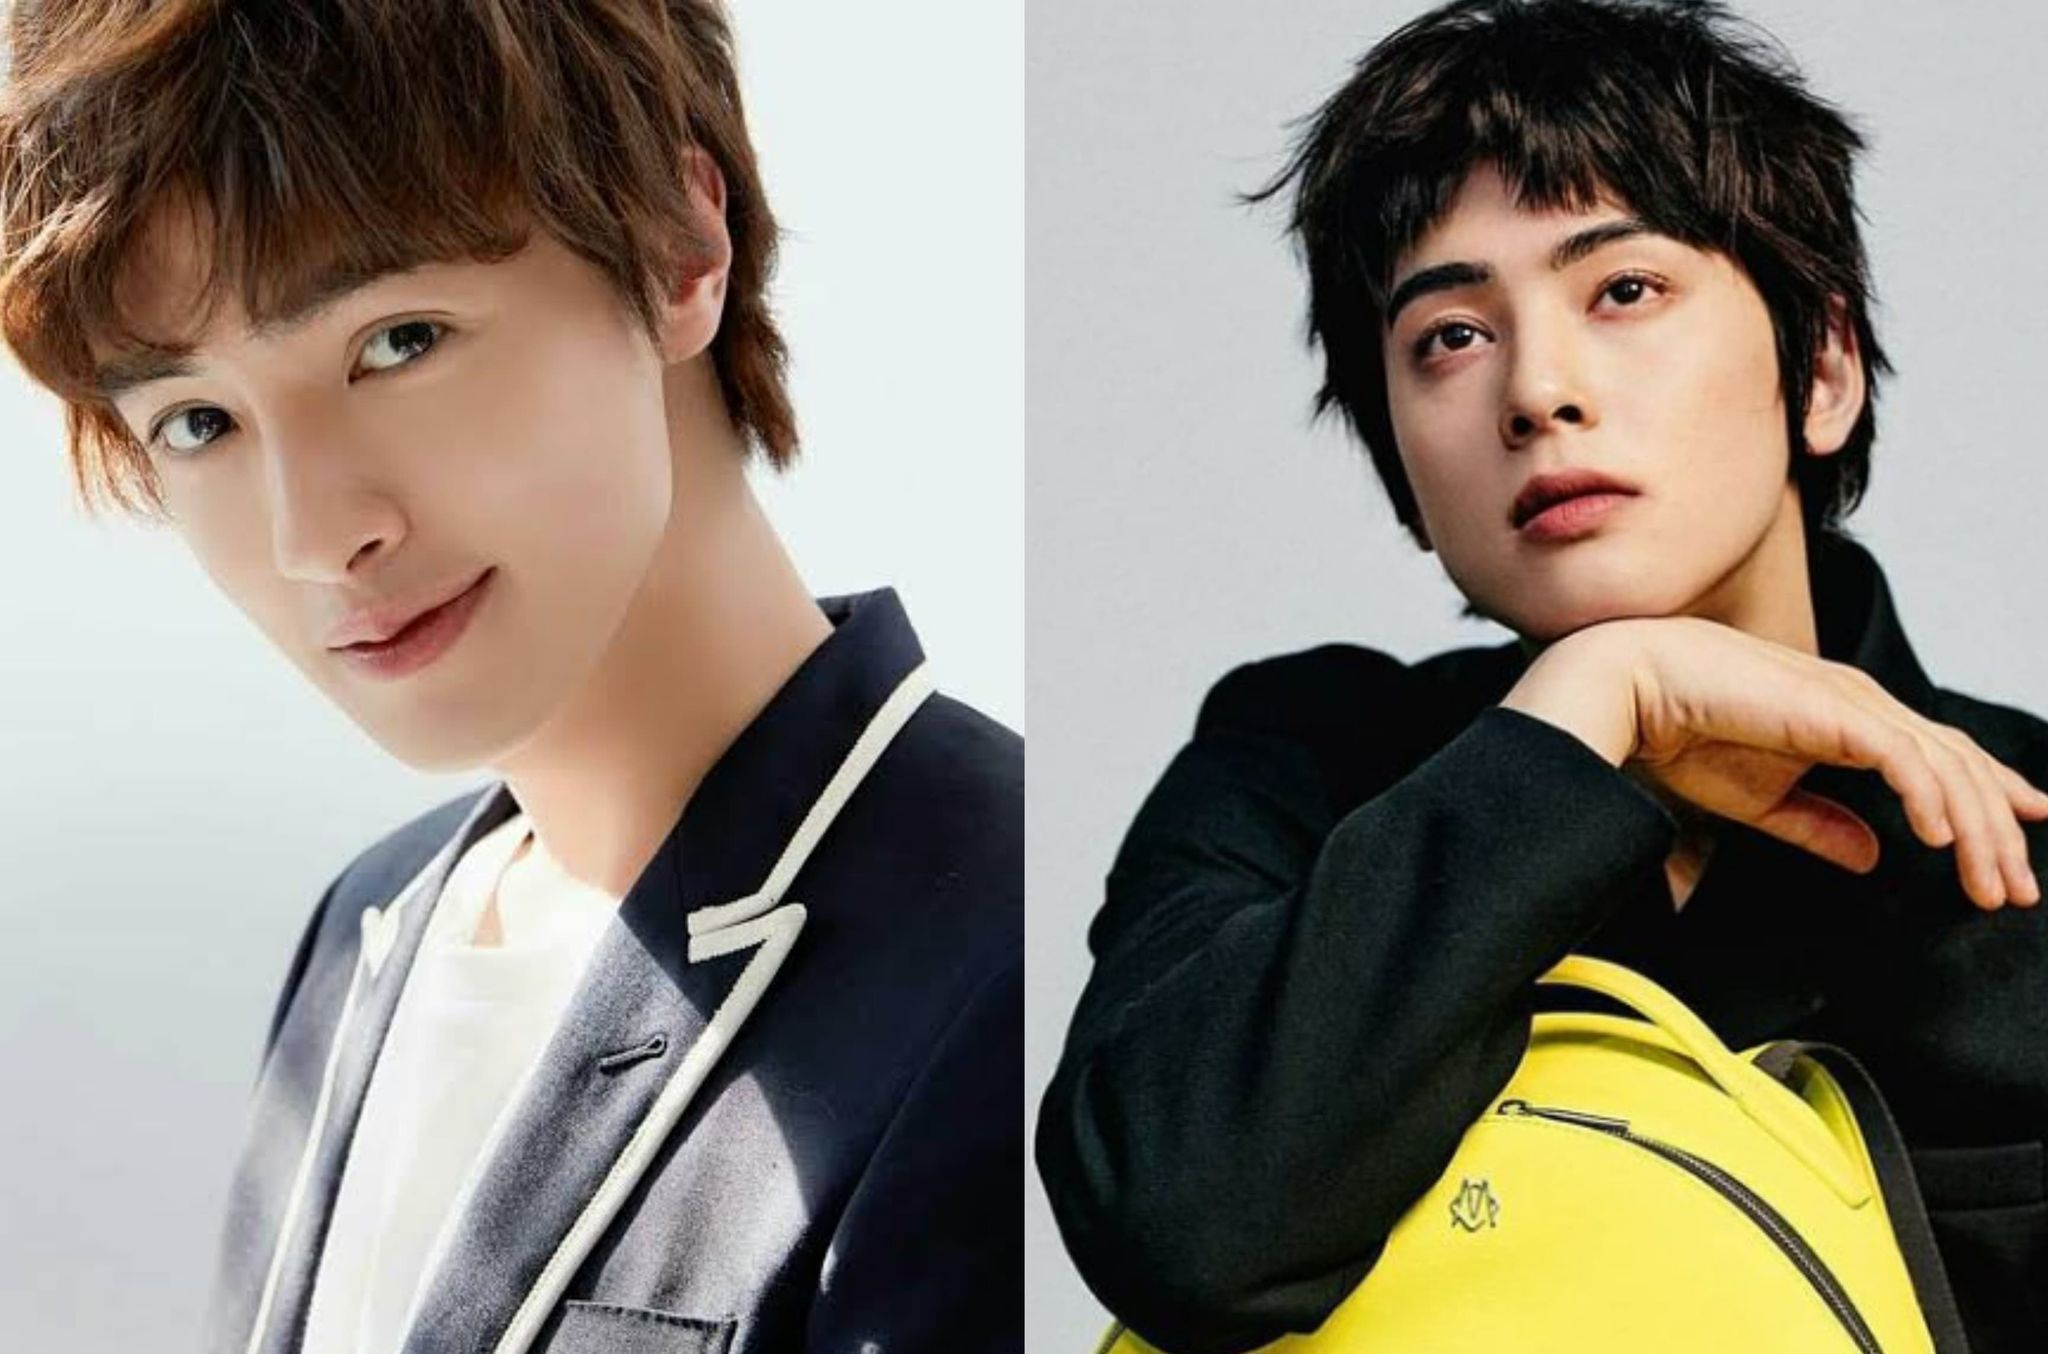 Darren Chen and Cha Eun Woo